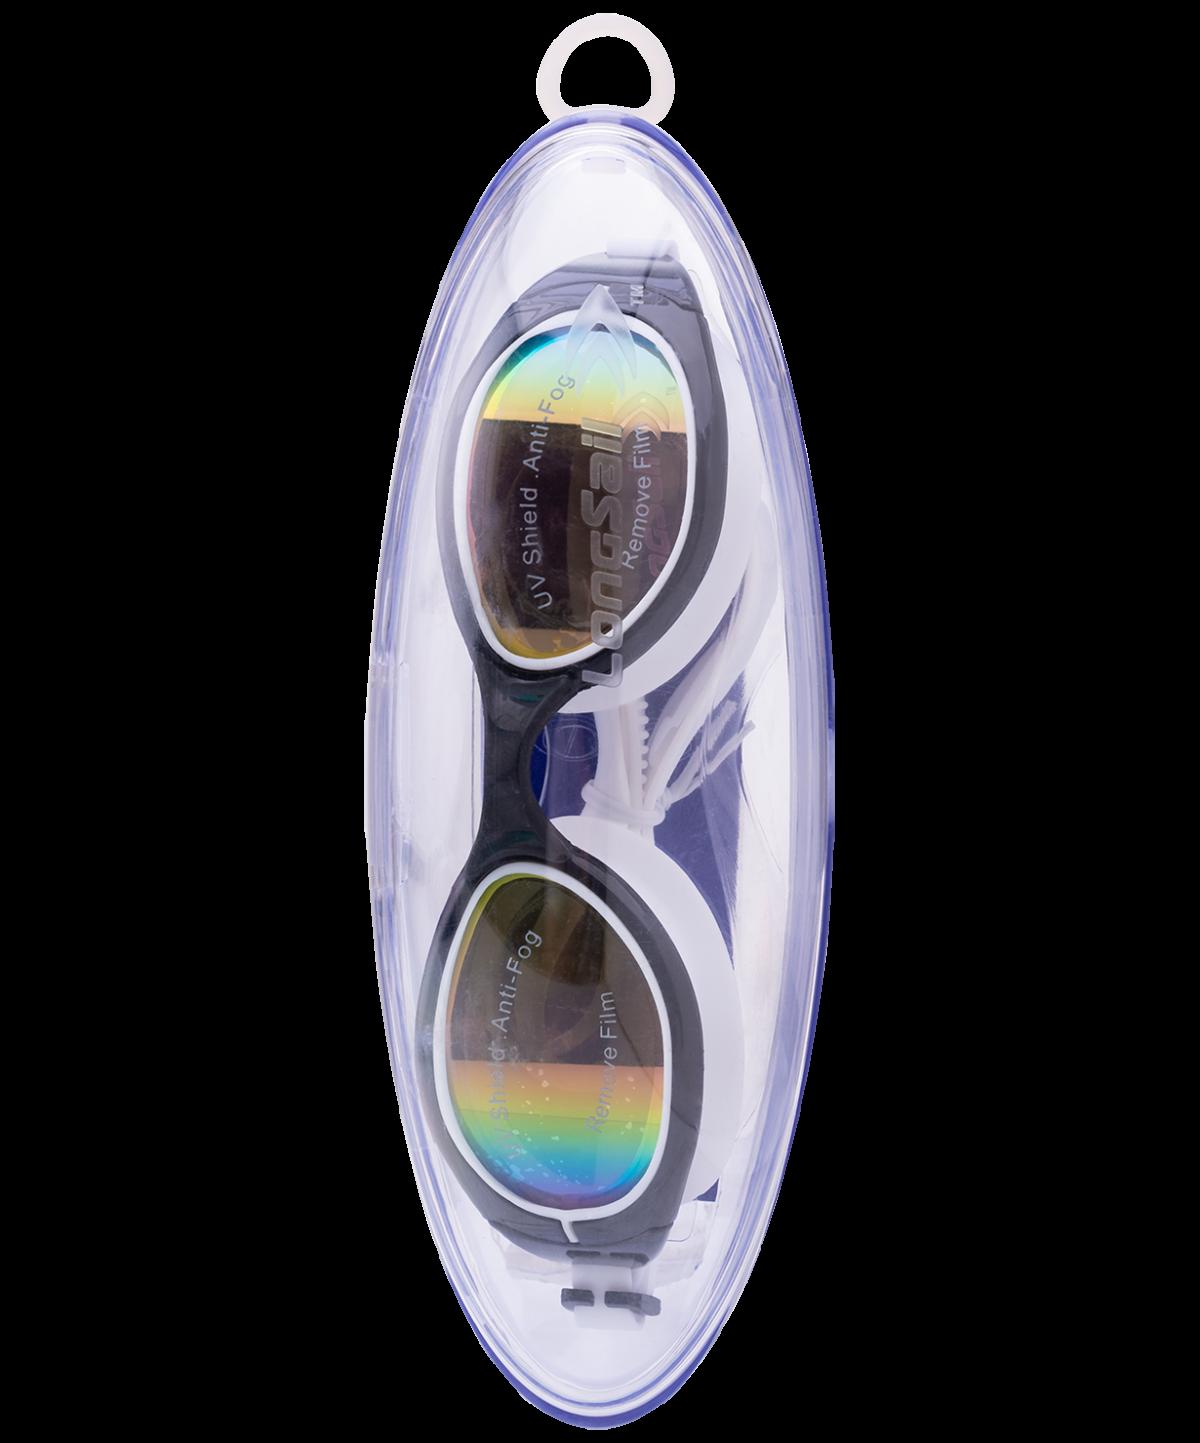 LONGSAIL Blaze Mirror Очки для плавания  L011707 - 3